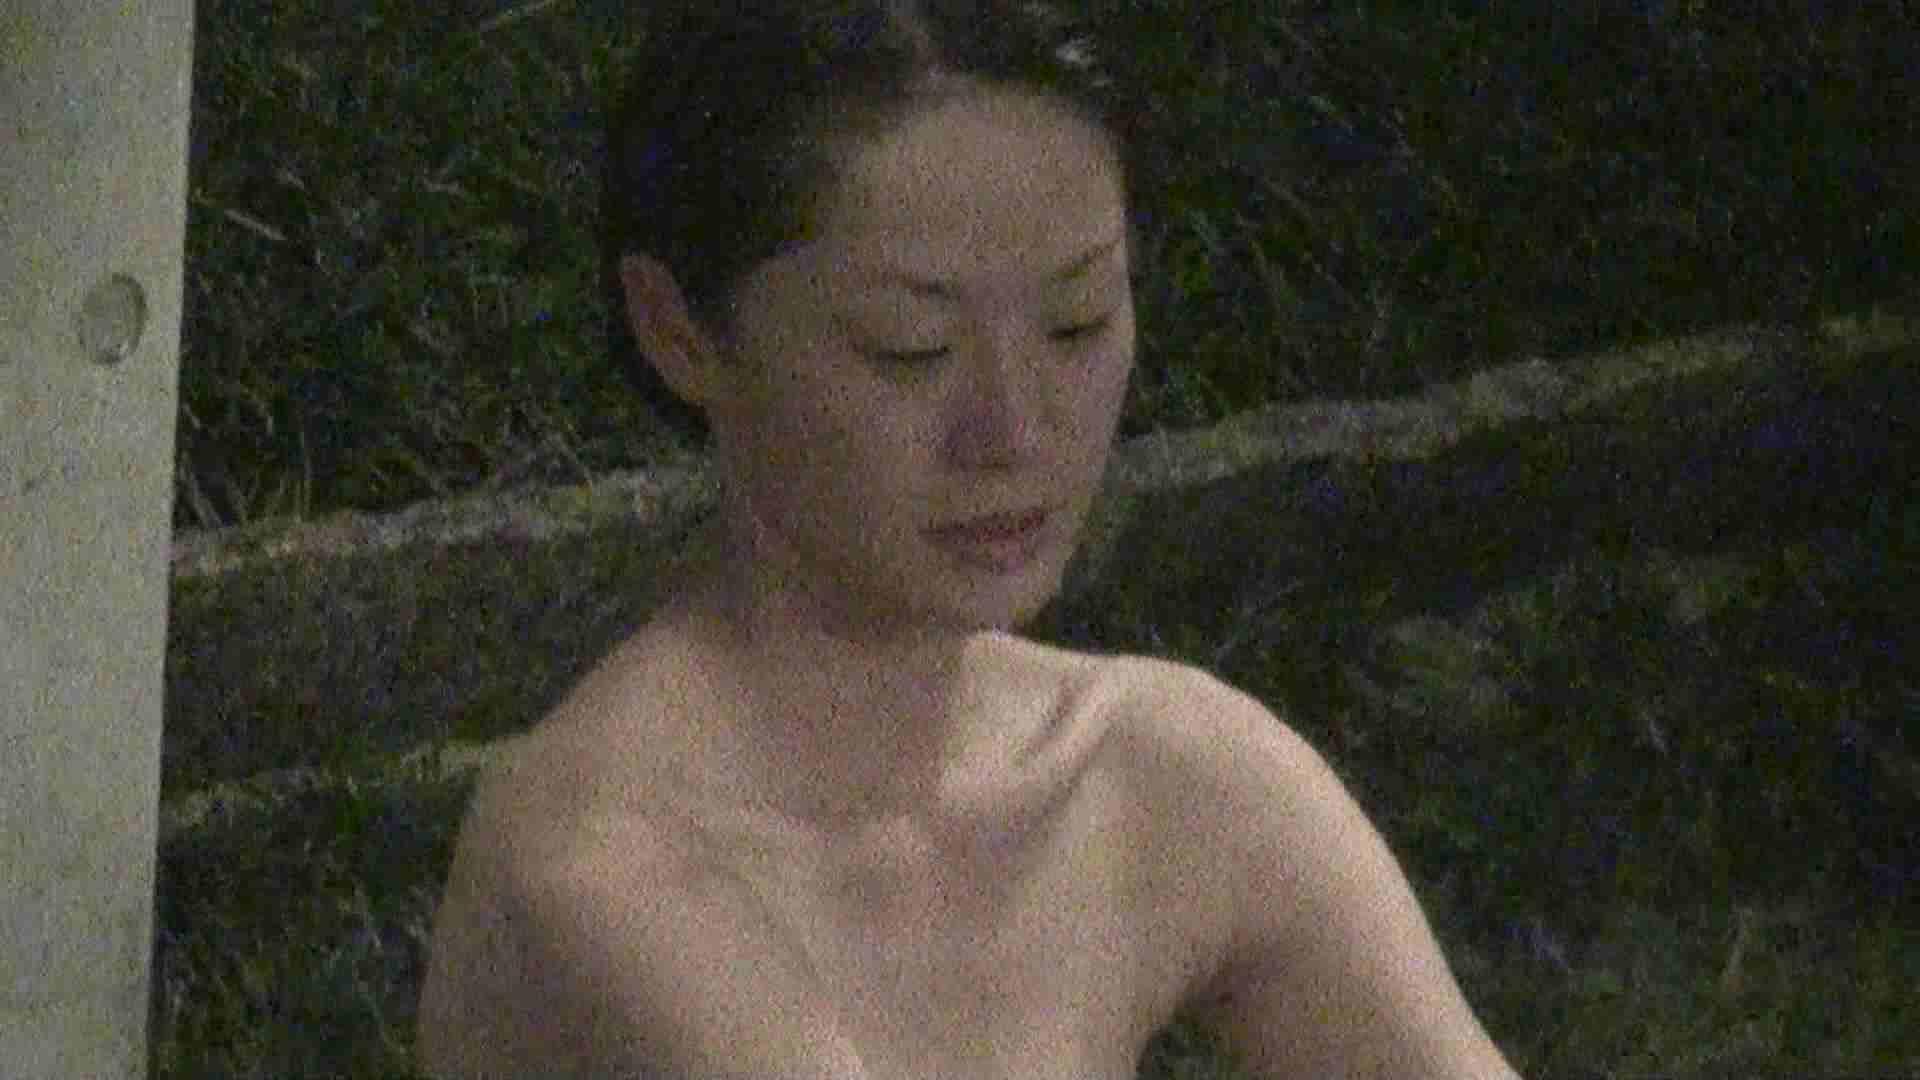 Aquaな露天風呂Vol.318 露天風呂編  109PIX 52